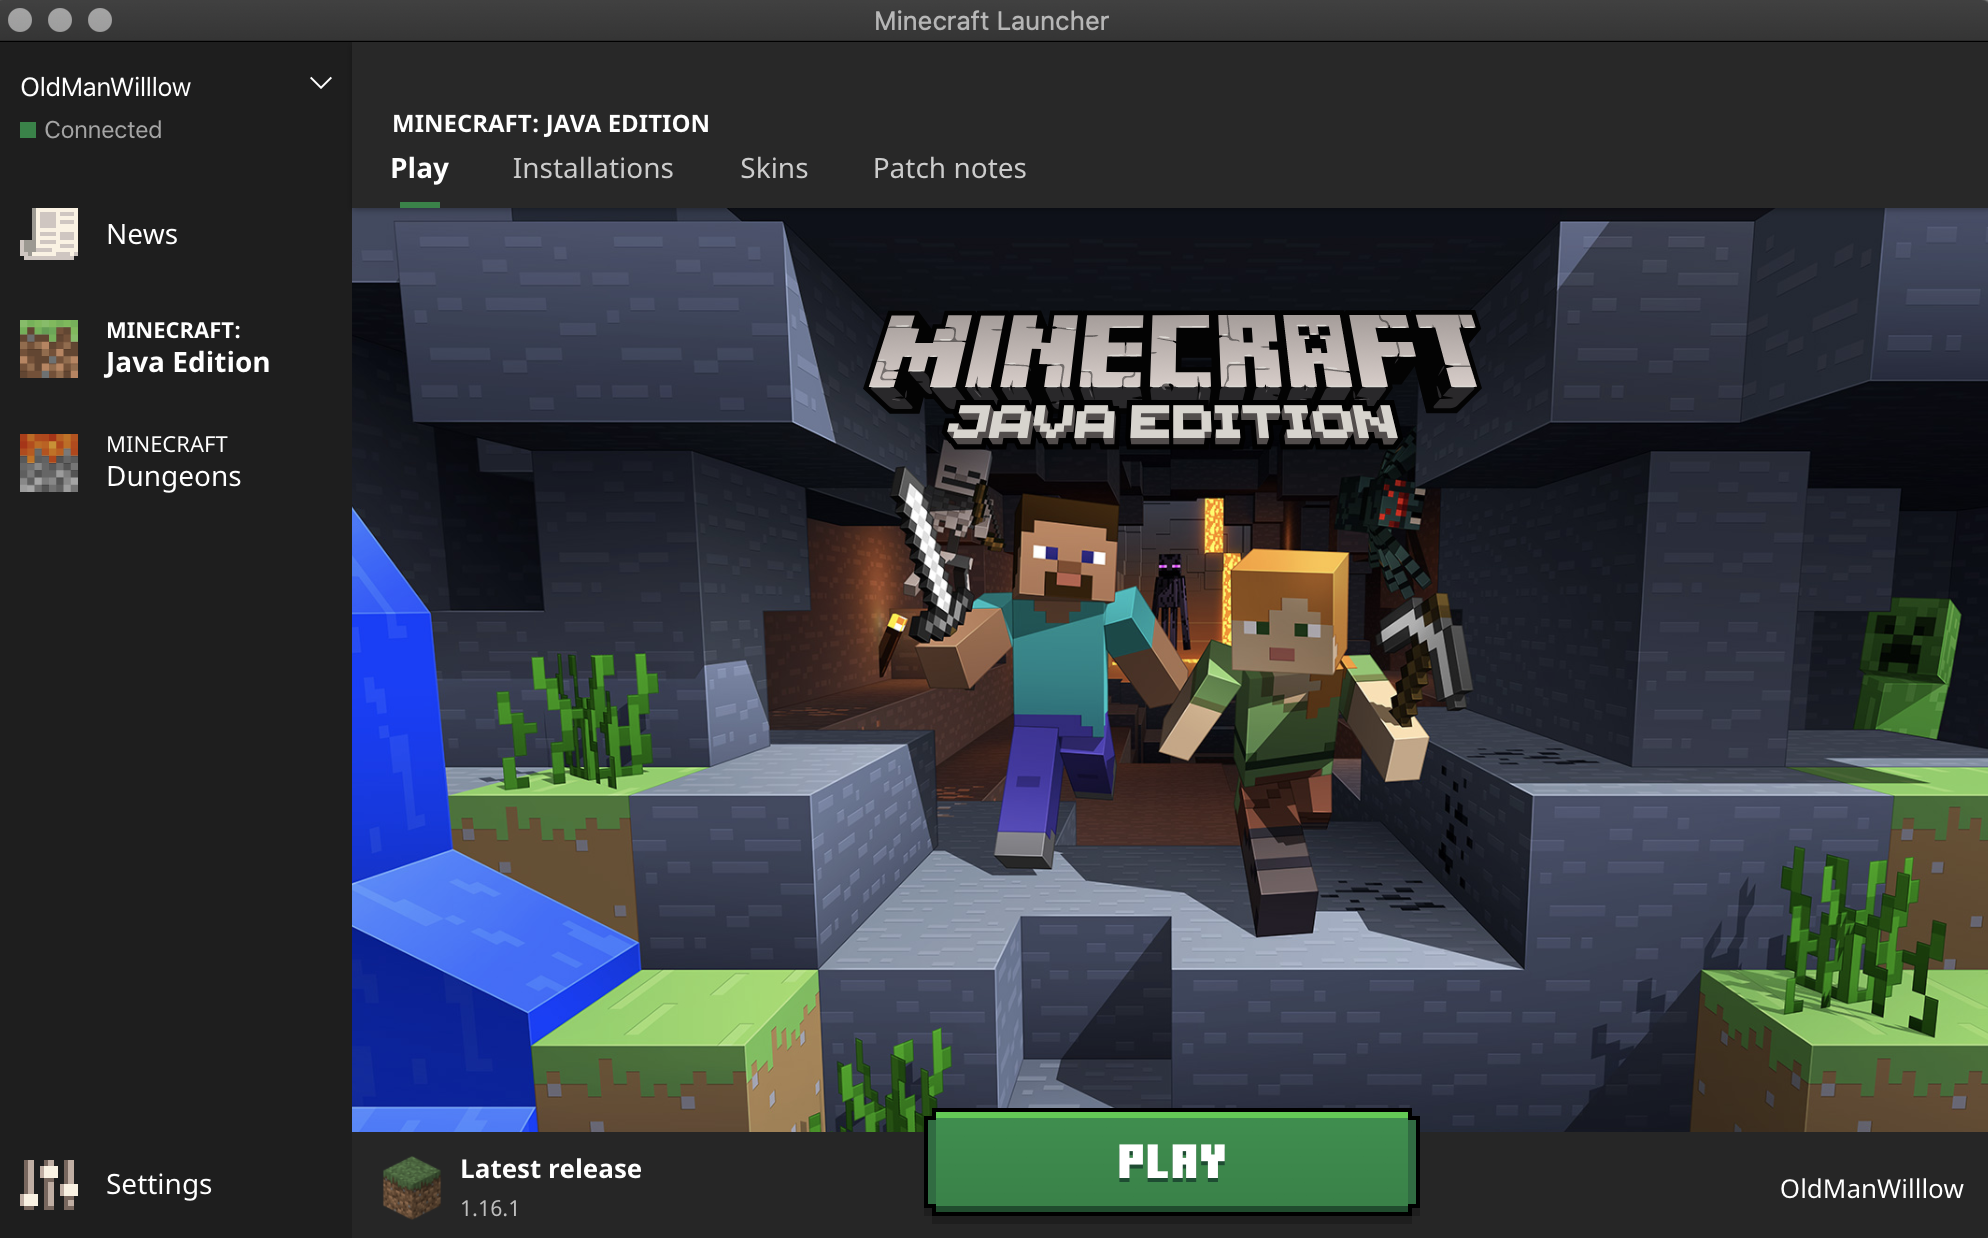 MC-1222] Minecraft stuck on 122.1226.122 - Jira